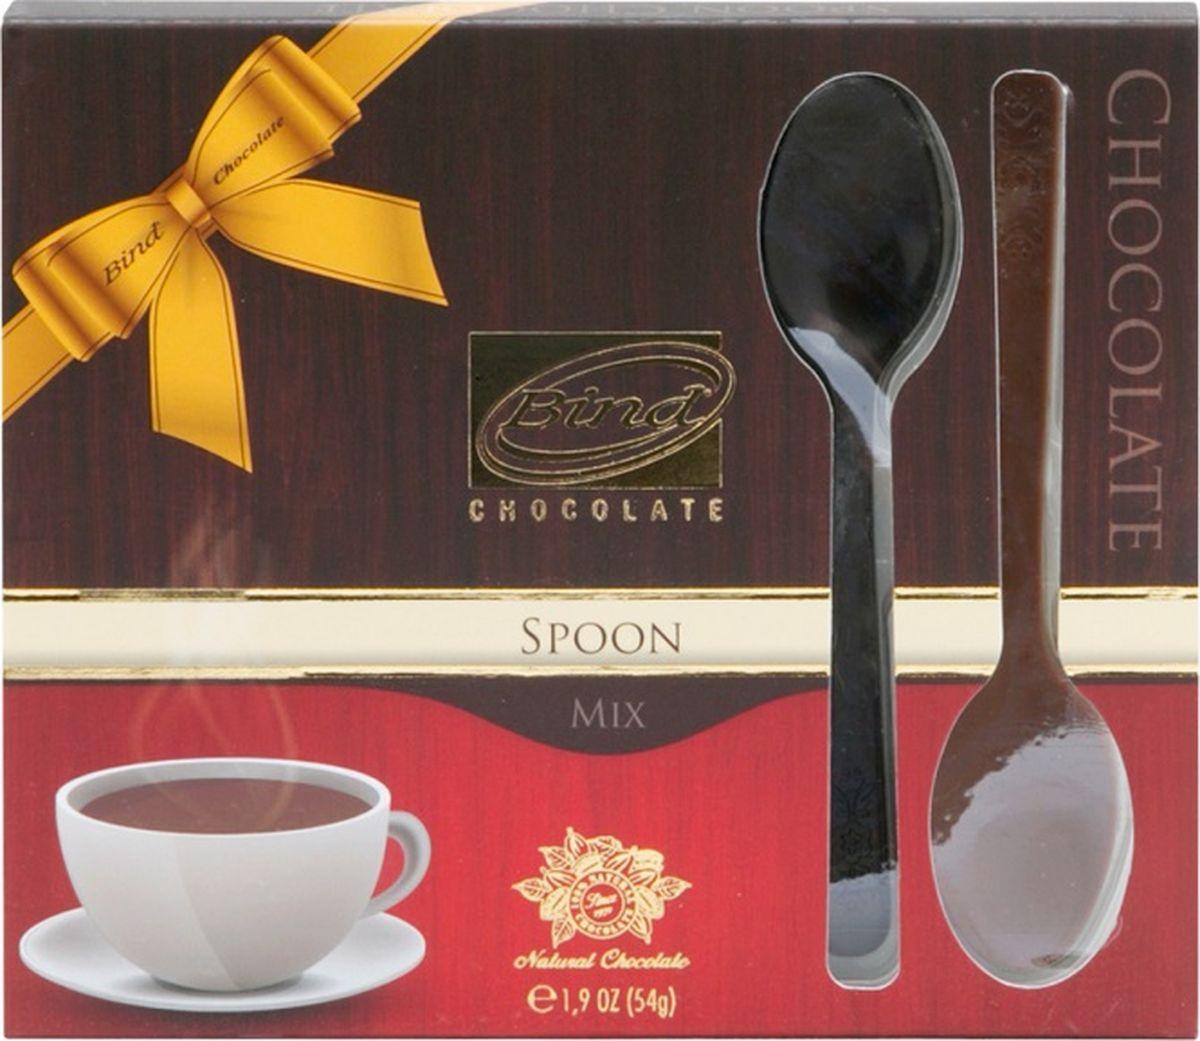 Bind Ложечка изделие из молочного и темного шоколада, 6 штPCK-6071Изделие из молочного и темного шоколада Ложечка.